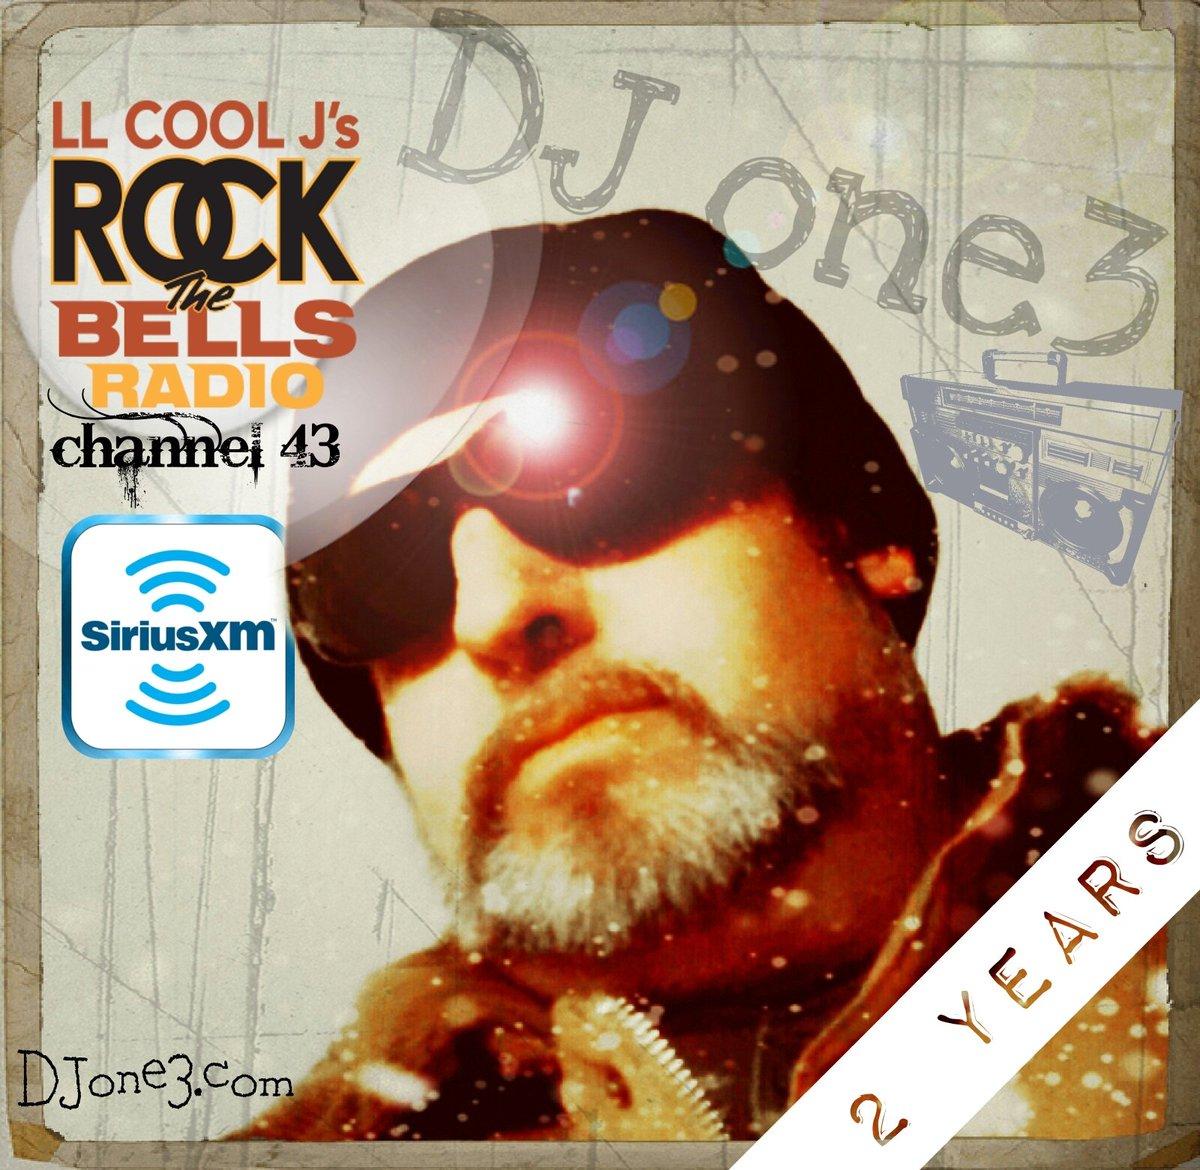 @llcoolj Happy  Anniversary RTB. 2 years baby! @RockTheBells #hiphopnation #ROCKtheBELLSpic.twitter.com/XZGox5s3qw